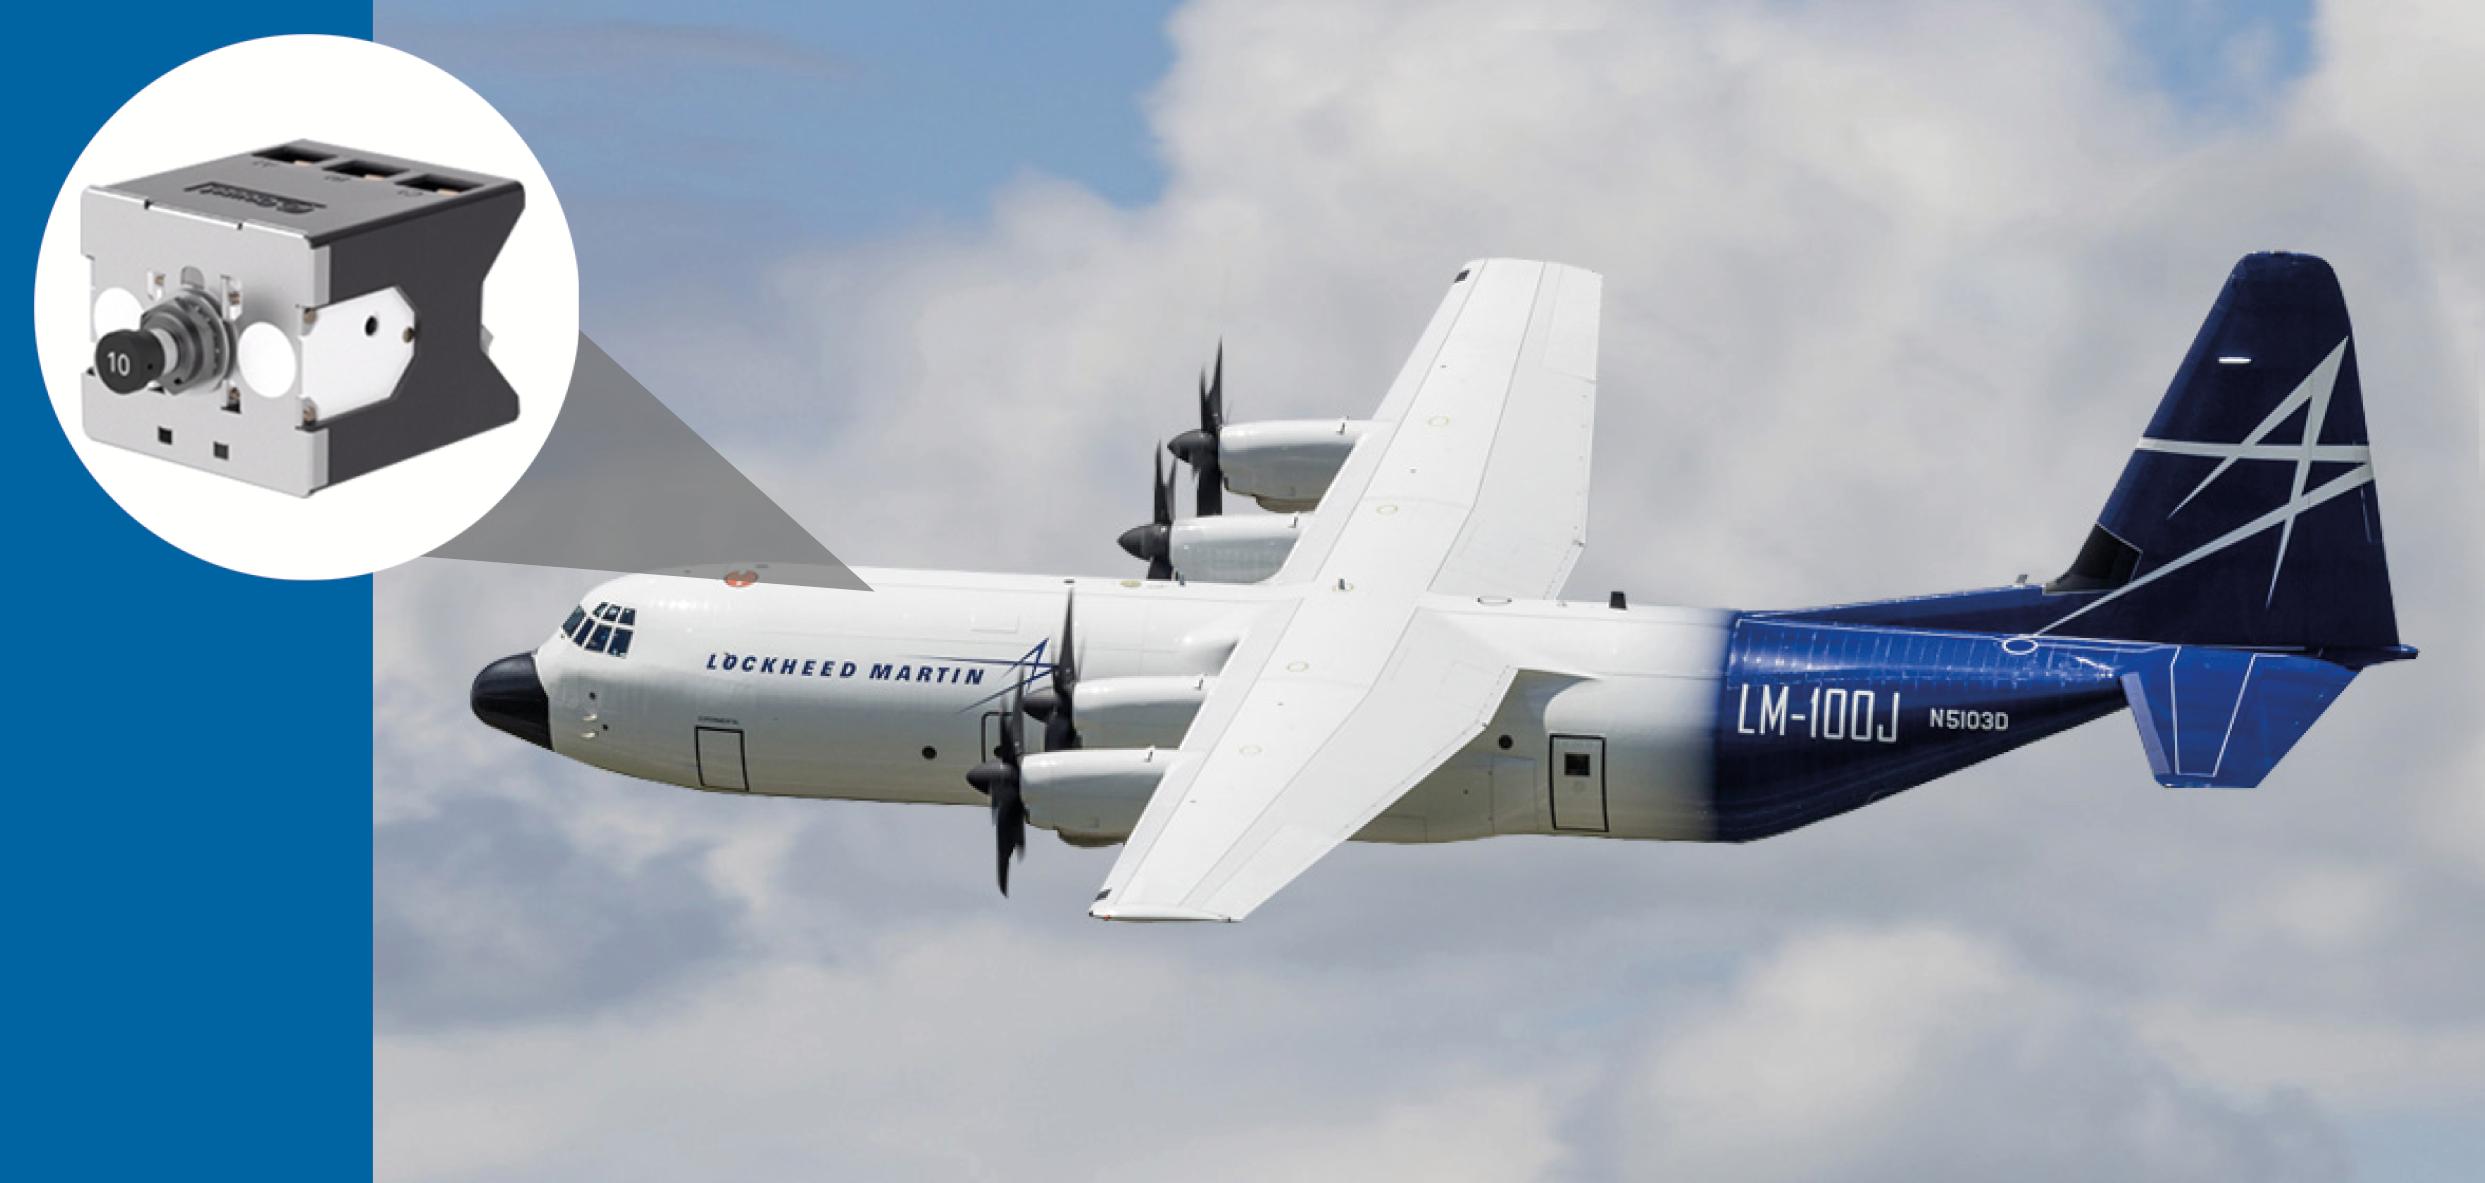 Lockheed-Martin LM-100J